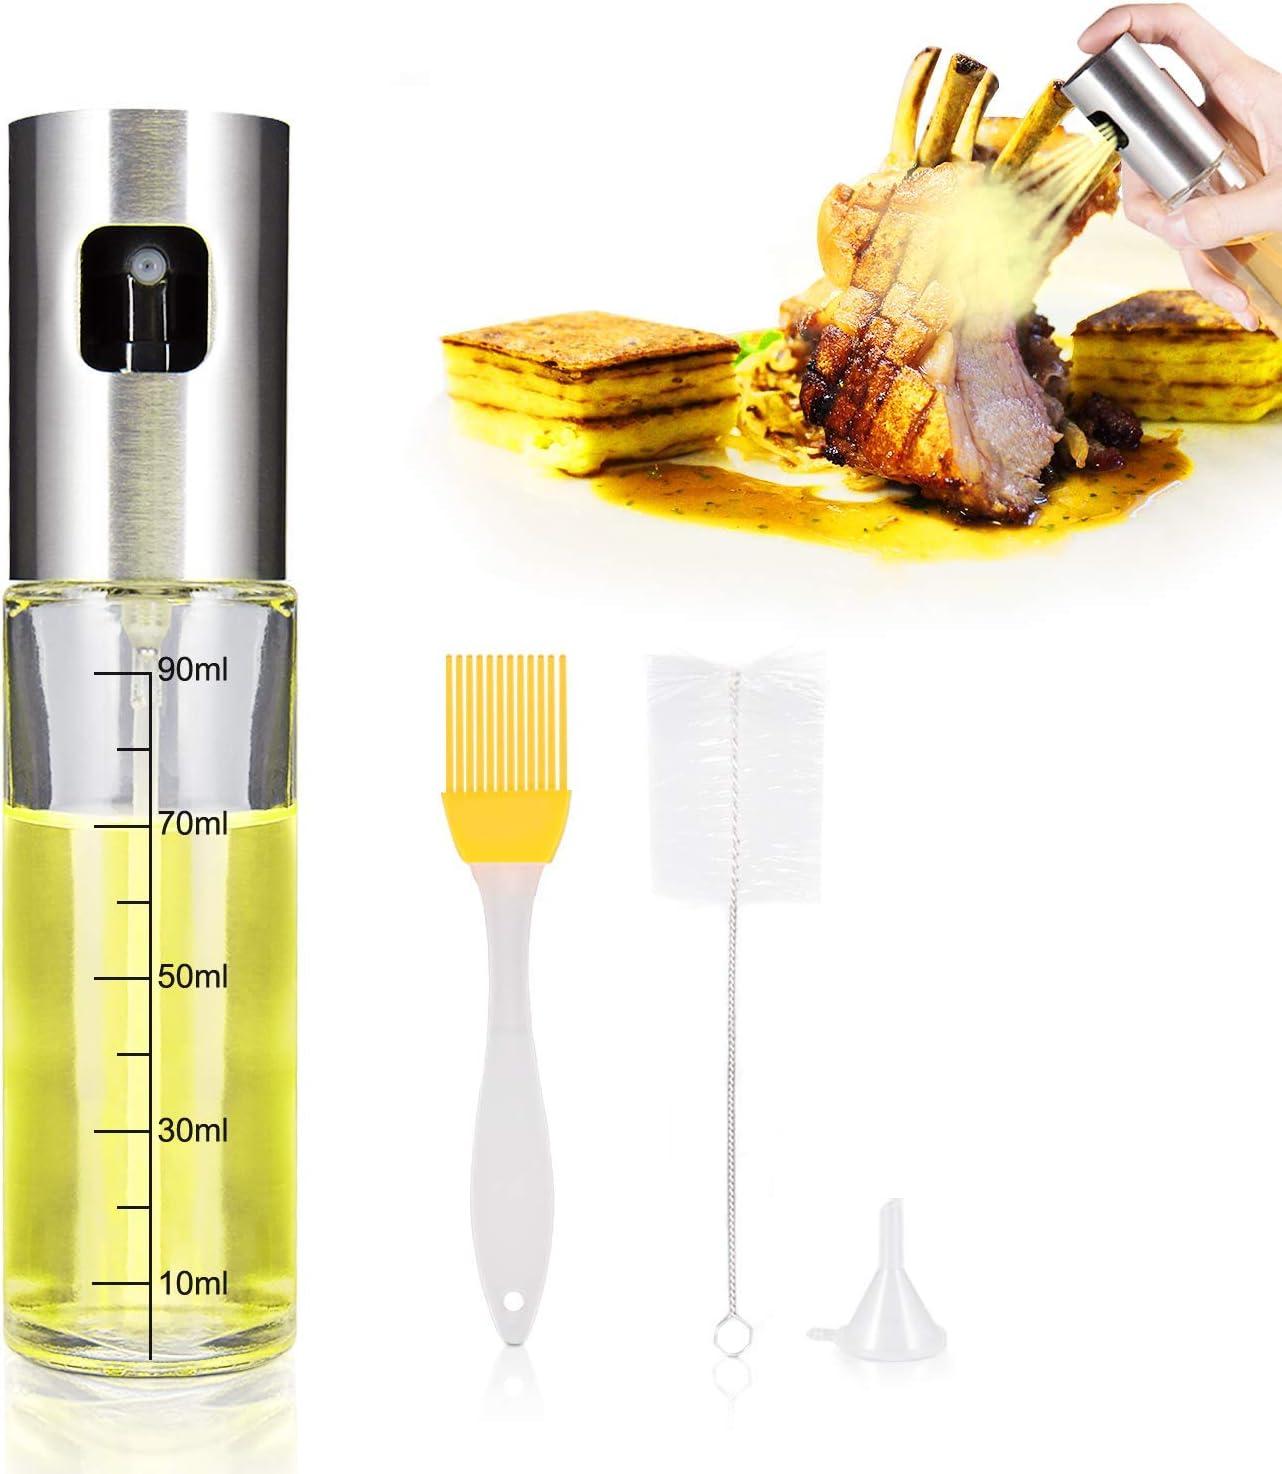 iTrunk Dispensador de Pulverizador De Aceite Incluso Rociando Pulverizador de Botella de Aceite Vidrio de Grado Alimenticio Recargable Botella de Rociador de Aceite de Oliva para Cocinar